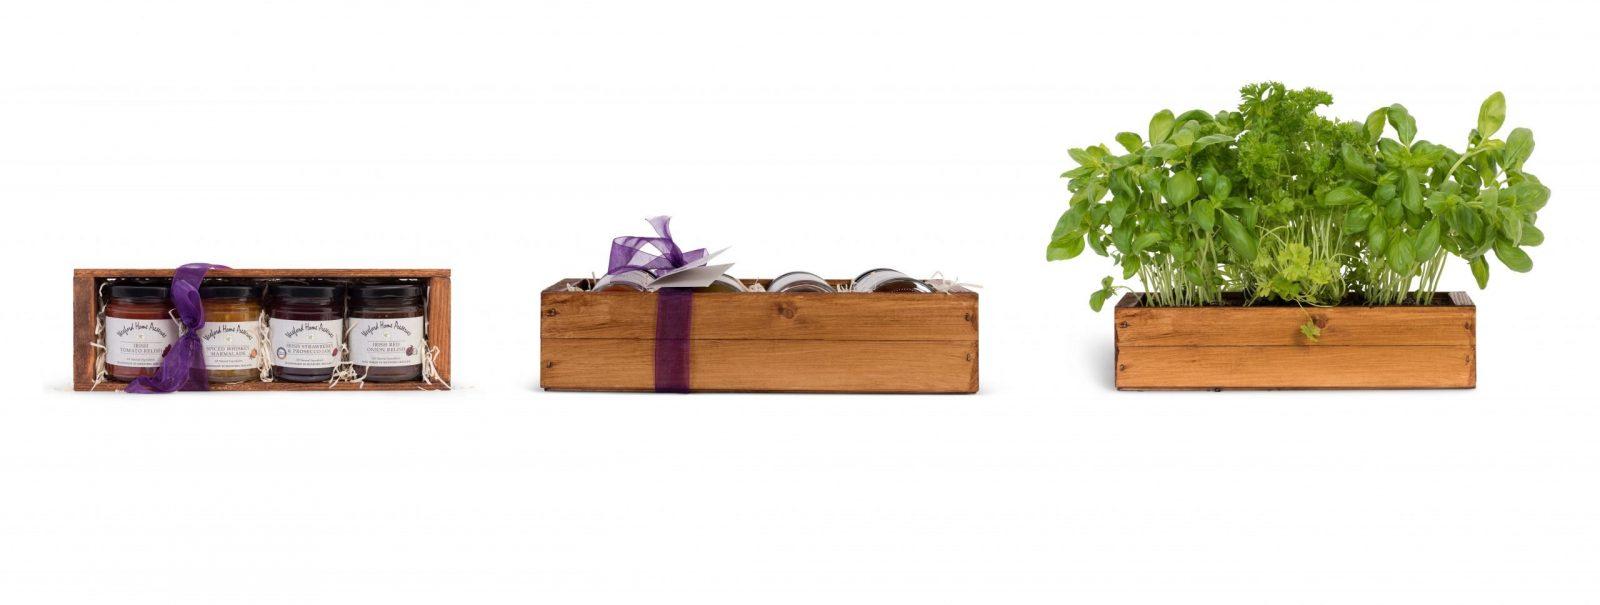 Wexford-Home-Preserves-Wooden-Box-Hamper